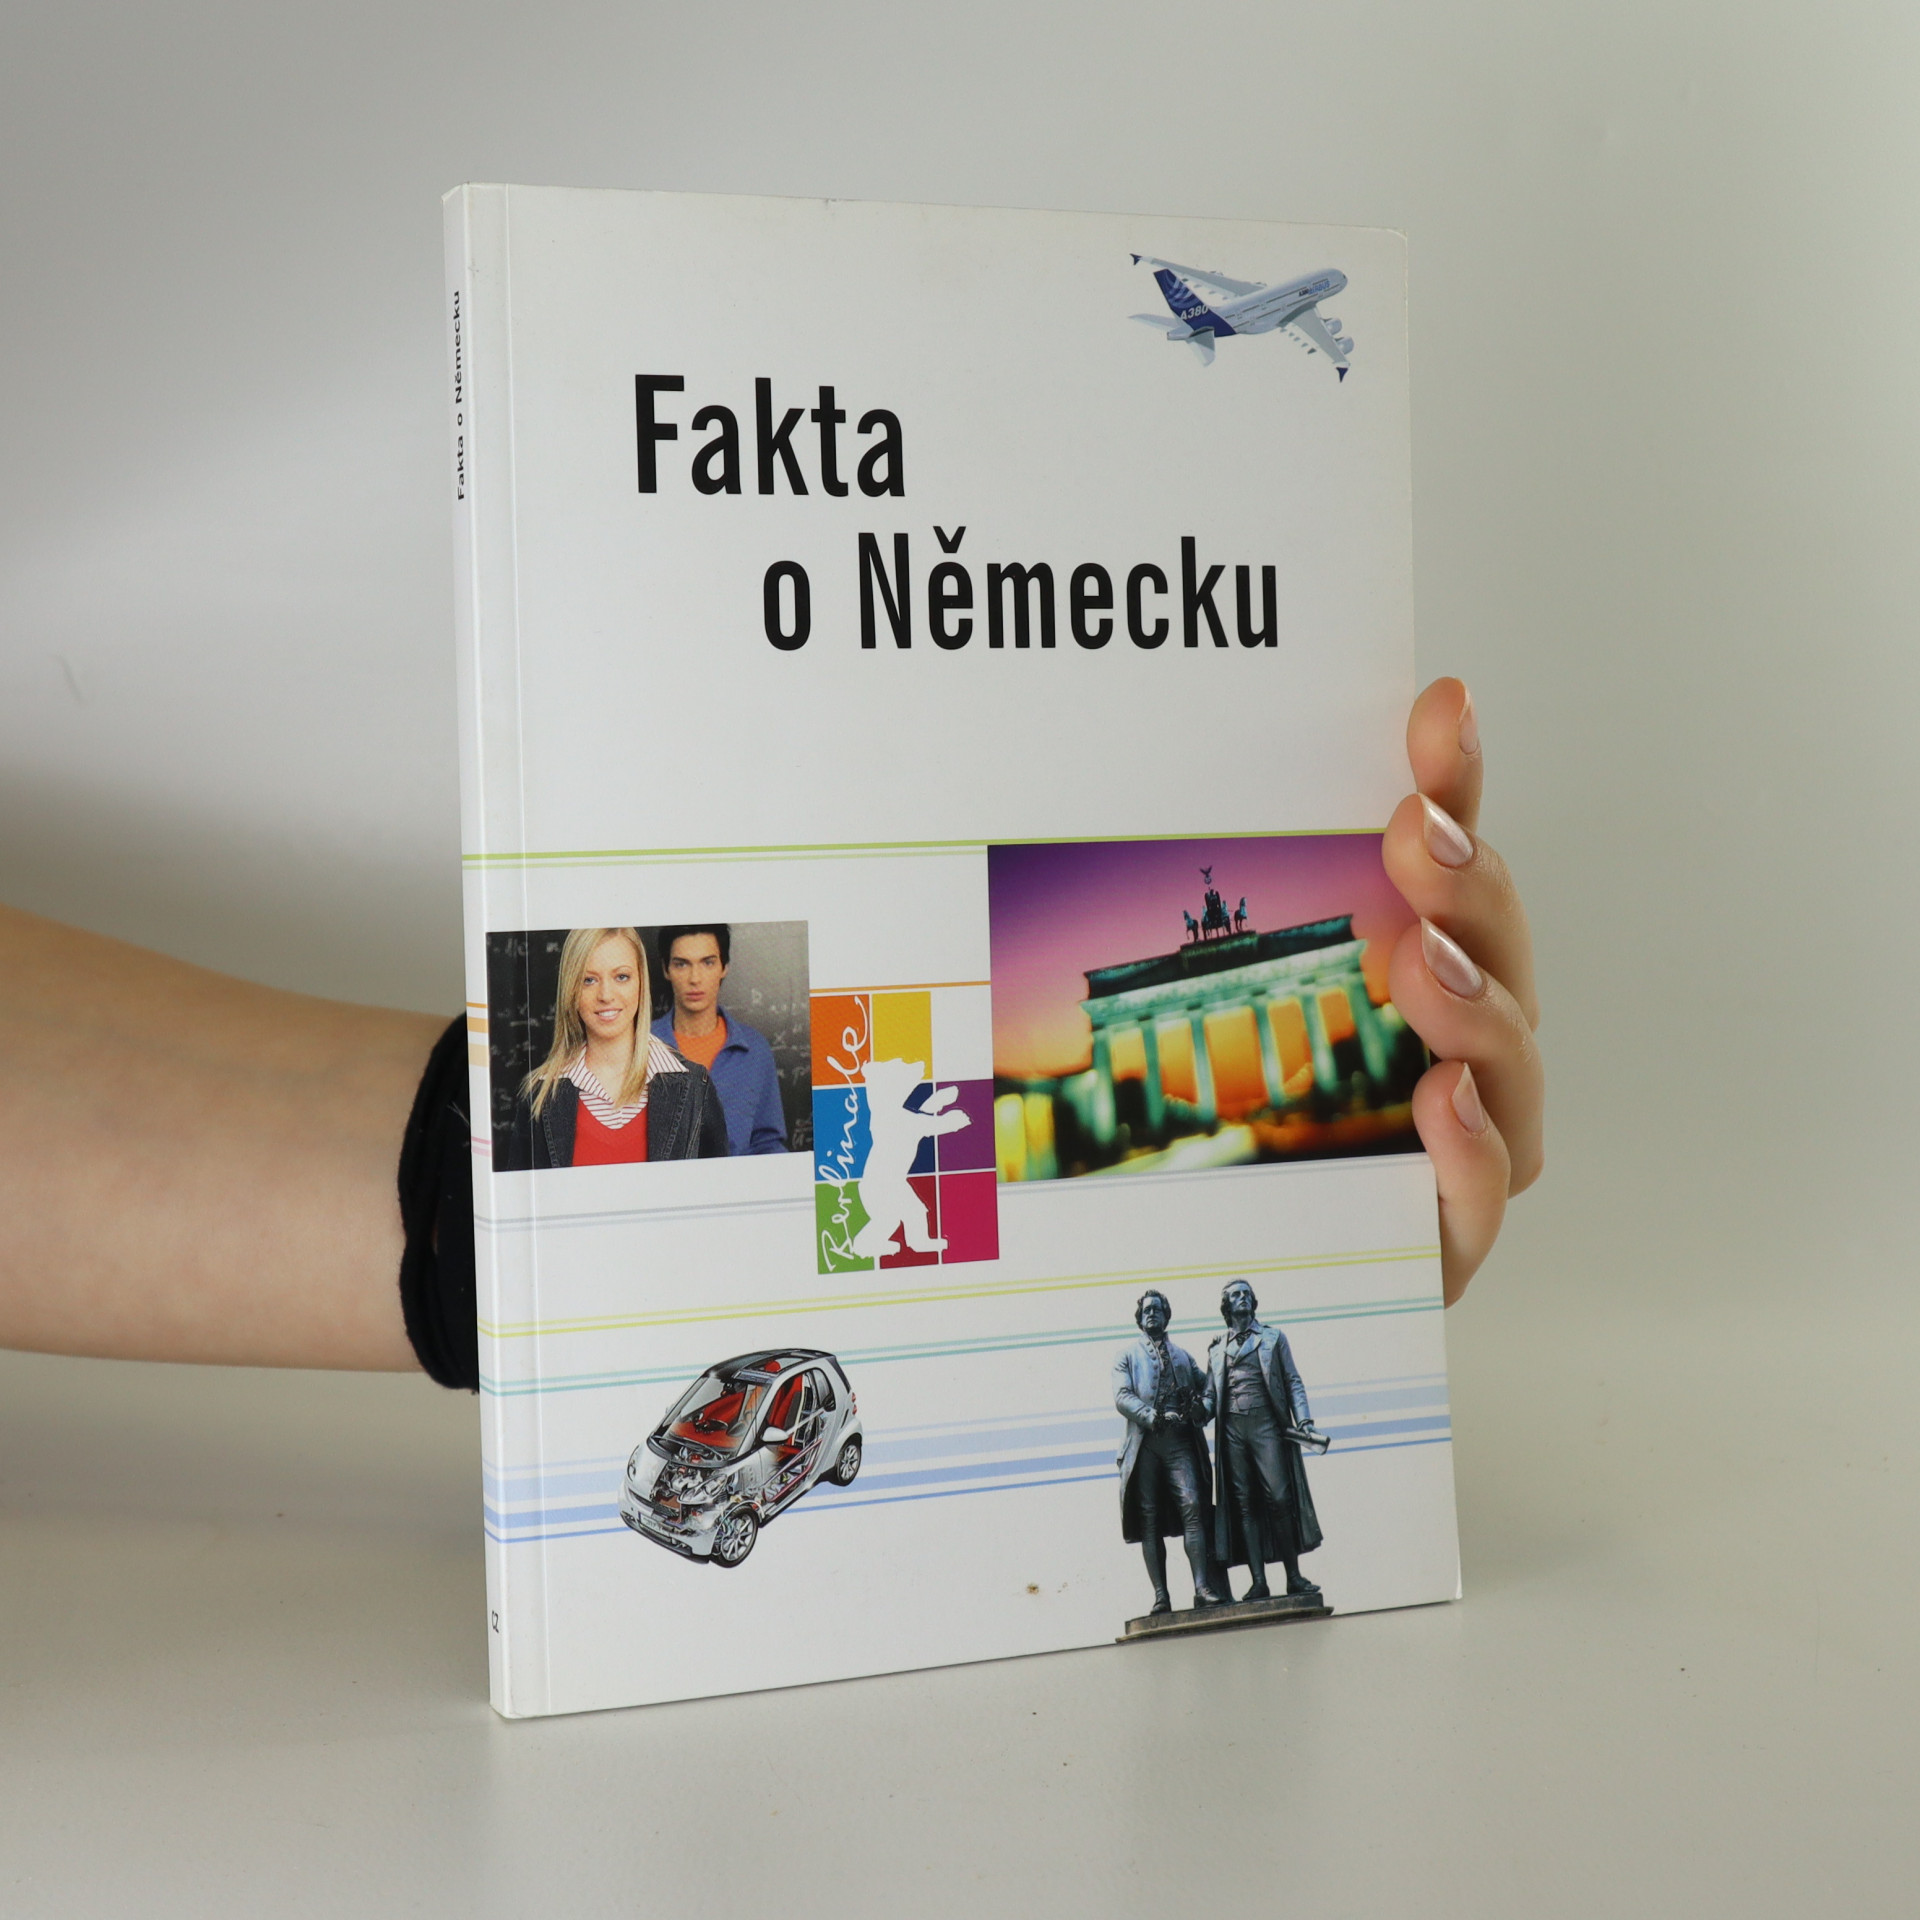 antikvární kniha Fakta o Německu, 2008